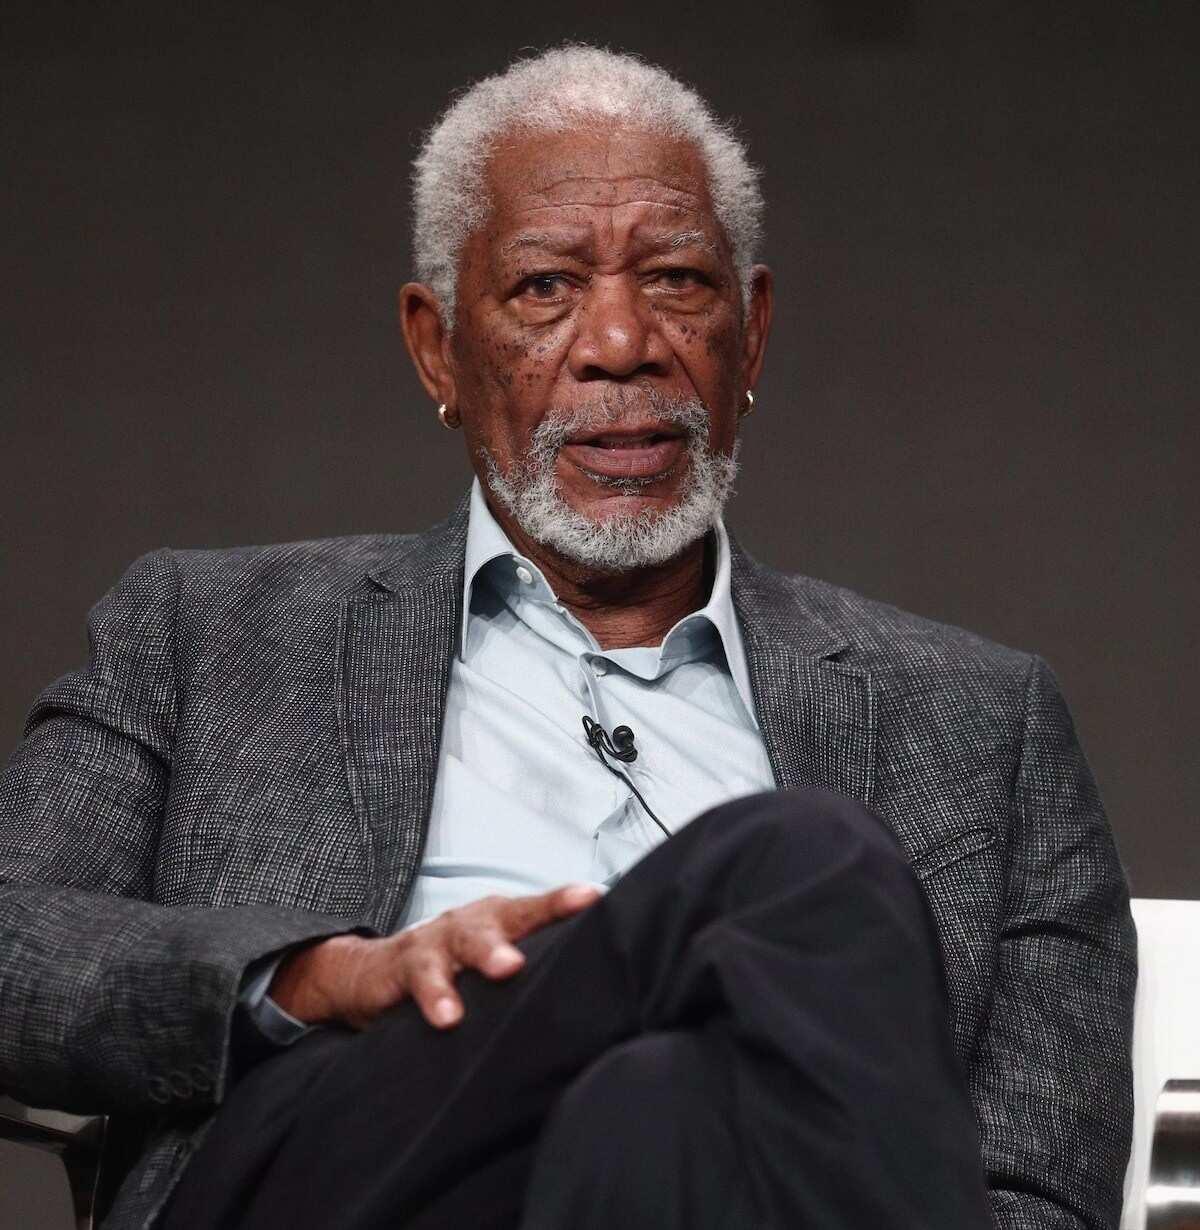 Veteran actor Morgan Freeman accused of harassment by 8 women